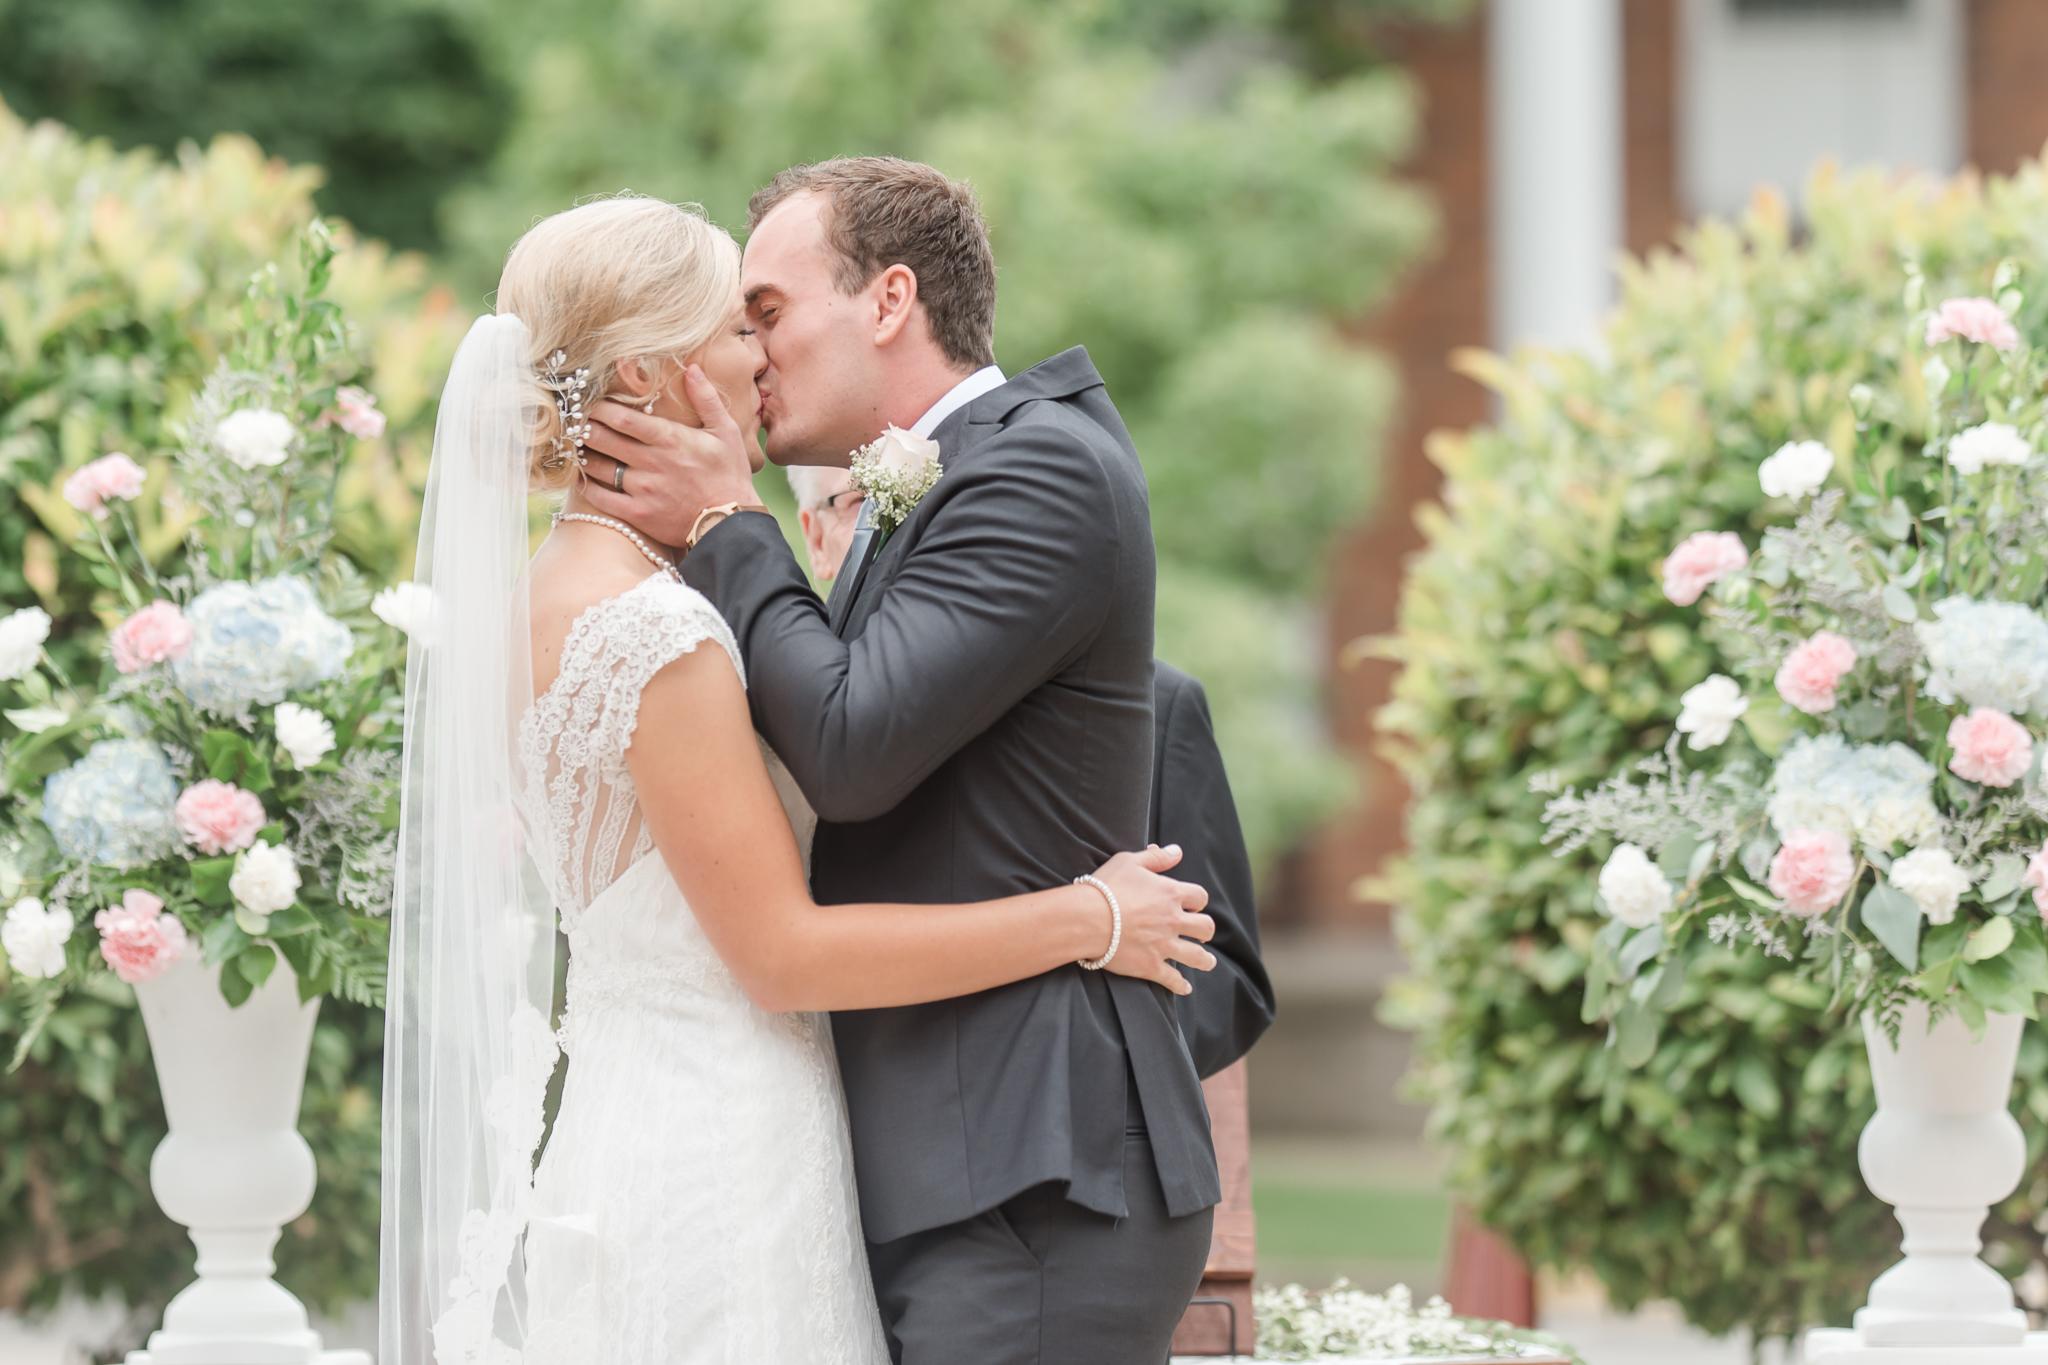 Westminister Hall Wedding Winona Lake Indiana9419.jpg